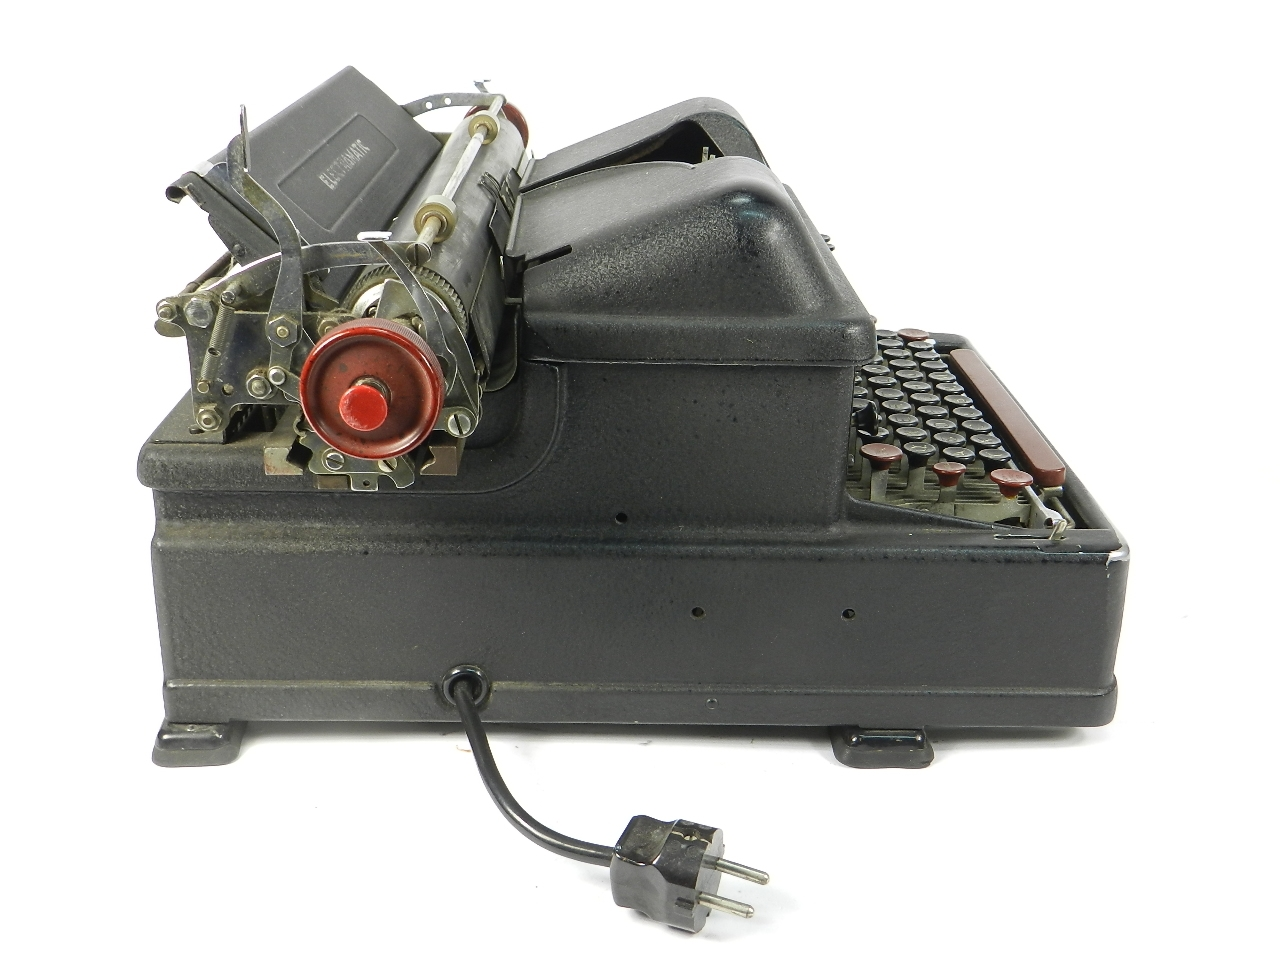 Imagen IBM ELECTROMATIC AÑO 1935 40299